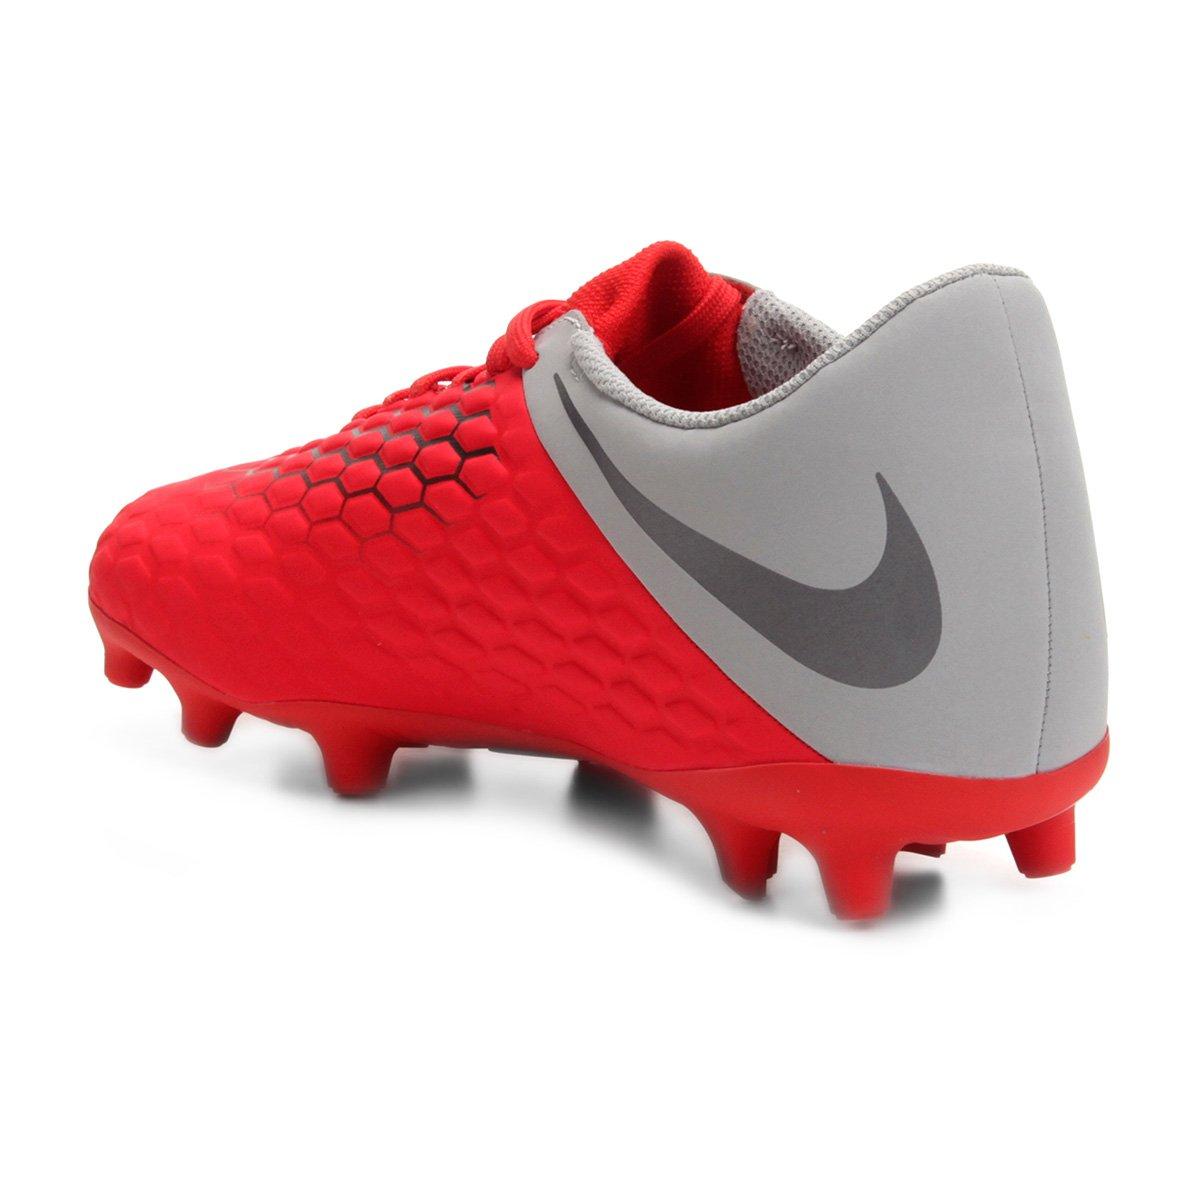 0c3549484 Chuteira Campo Nike Hypervenom Phantom 3 Club FG